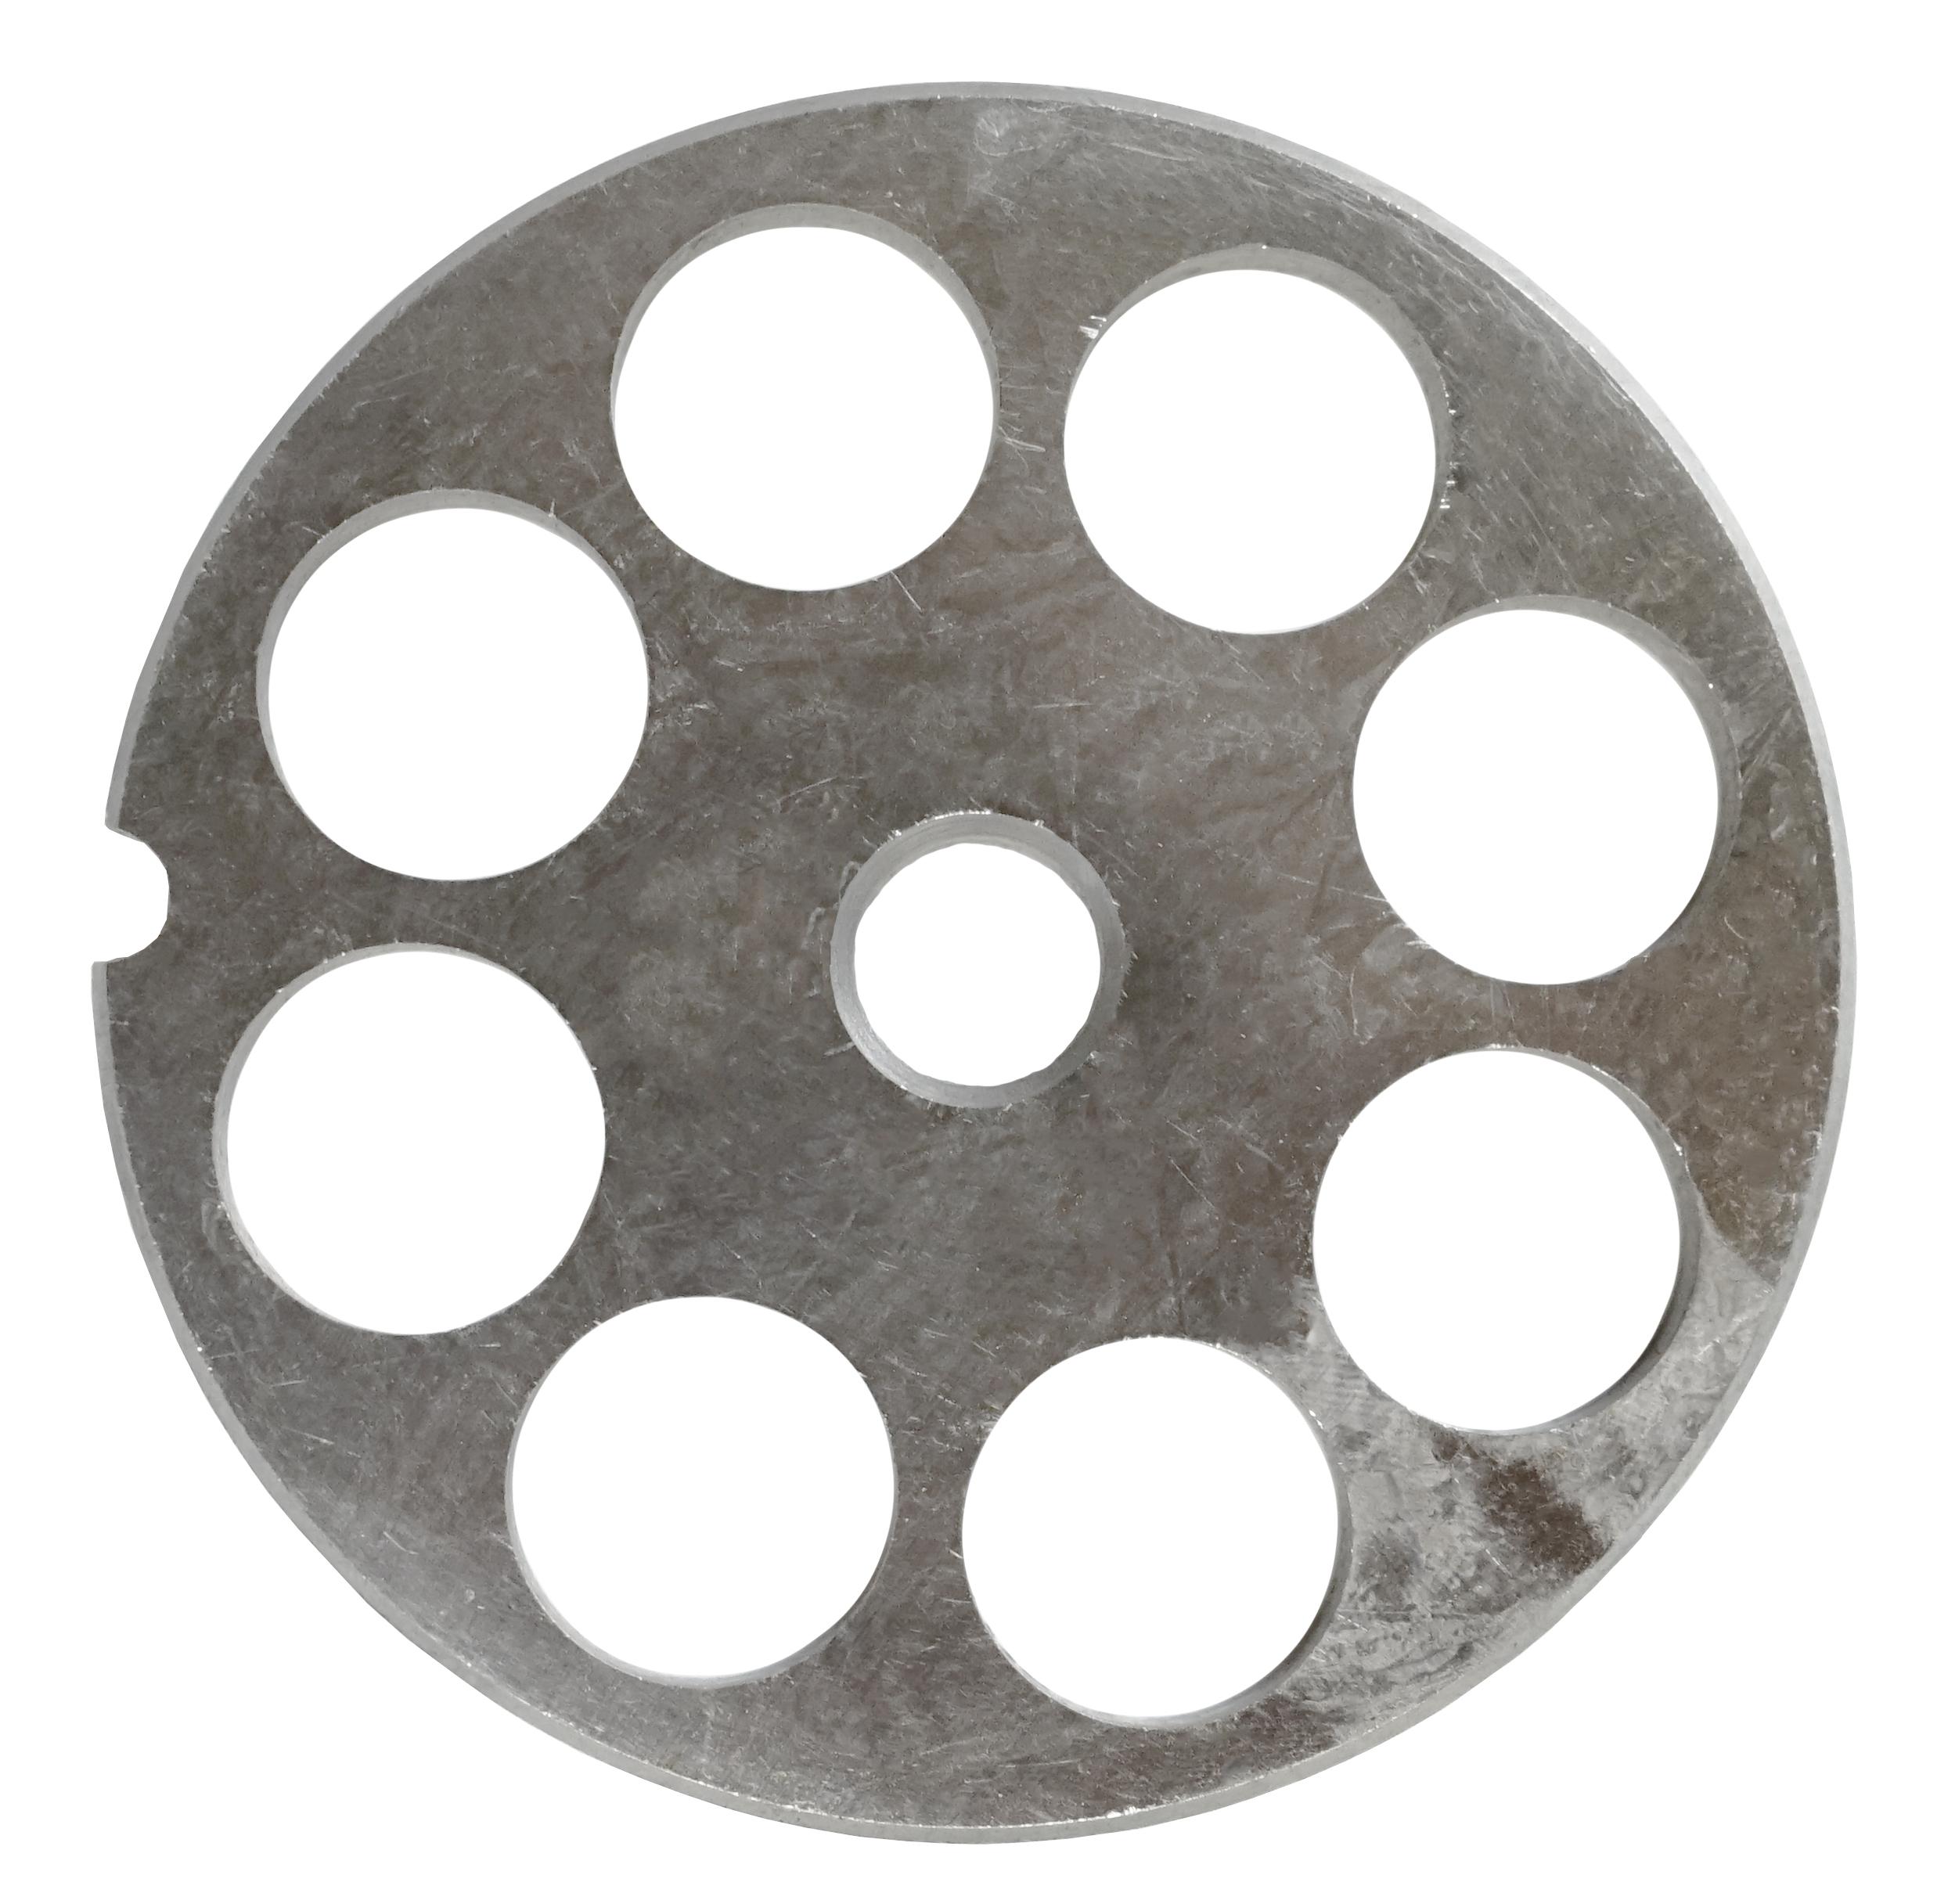 Globe L00781 meat grinder, accessories